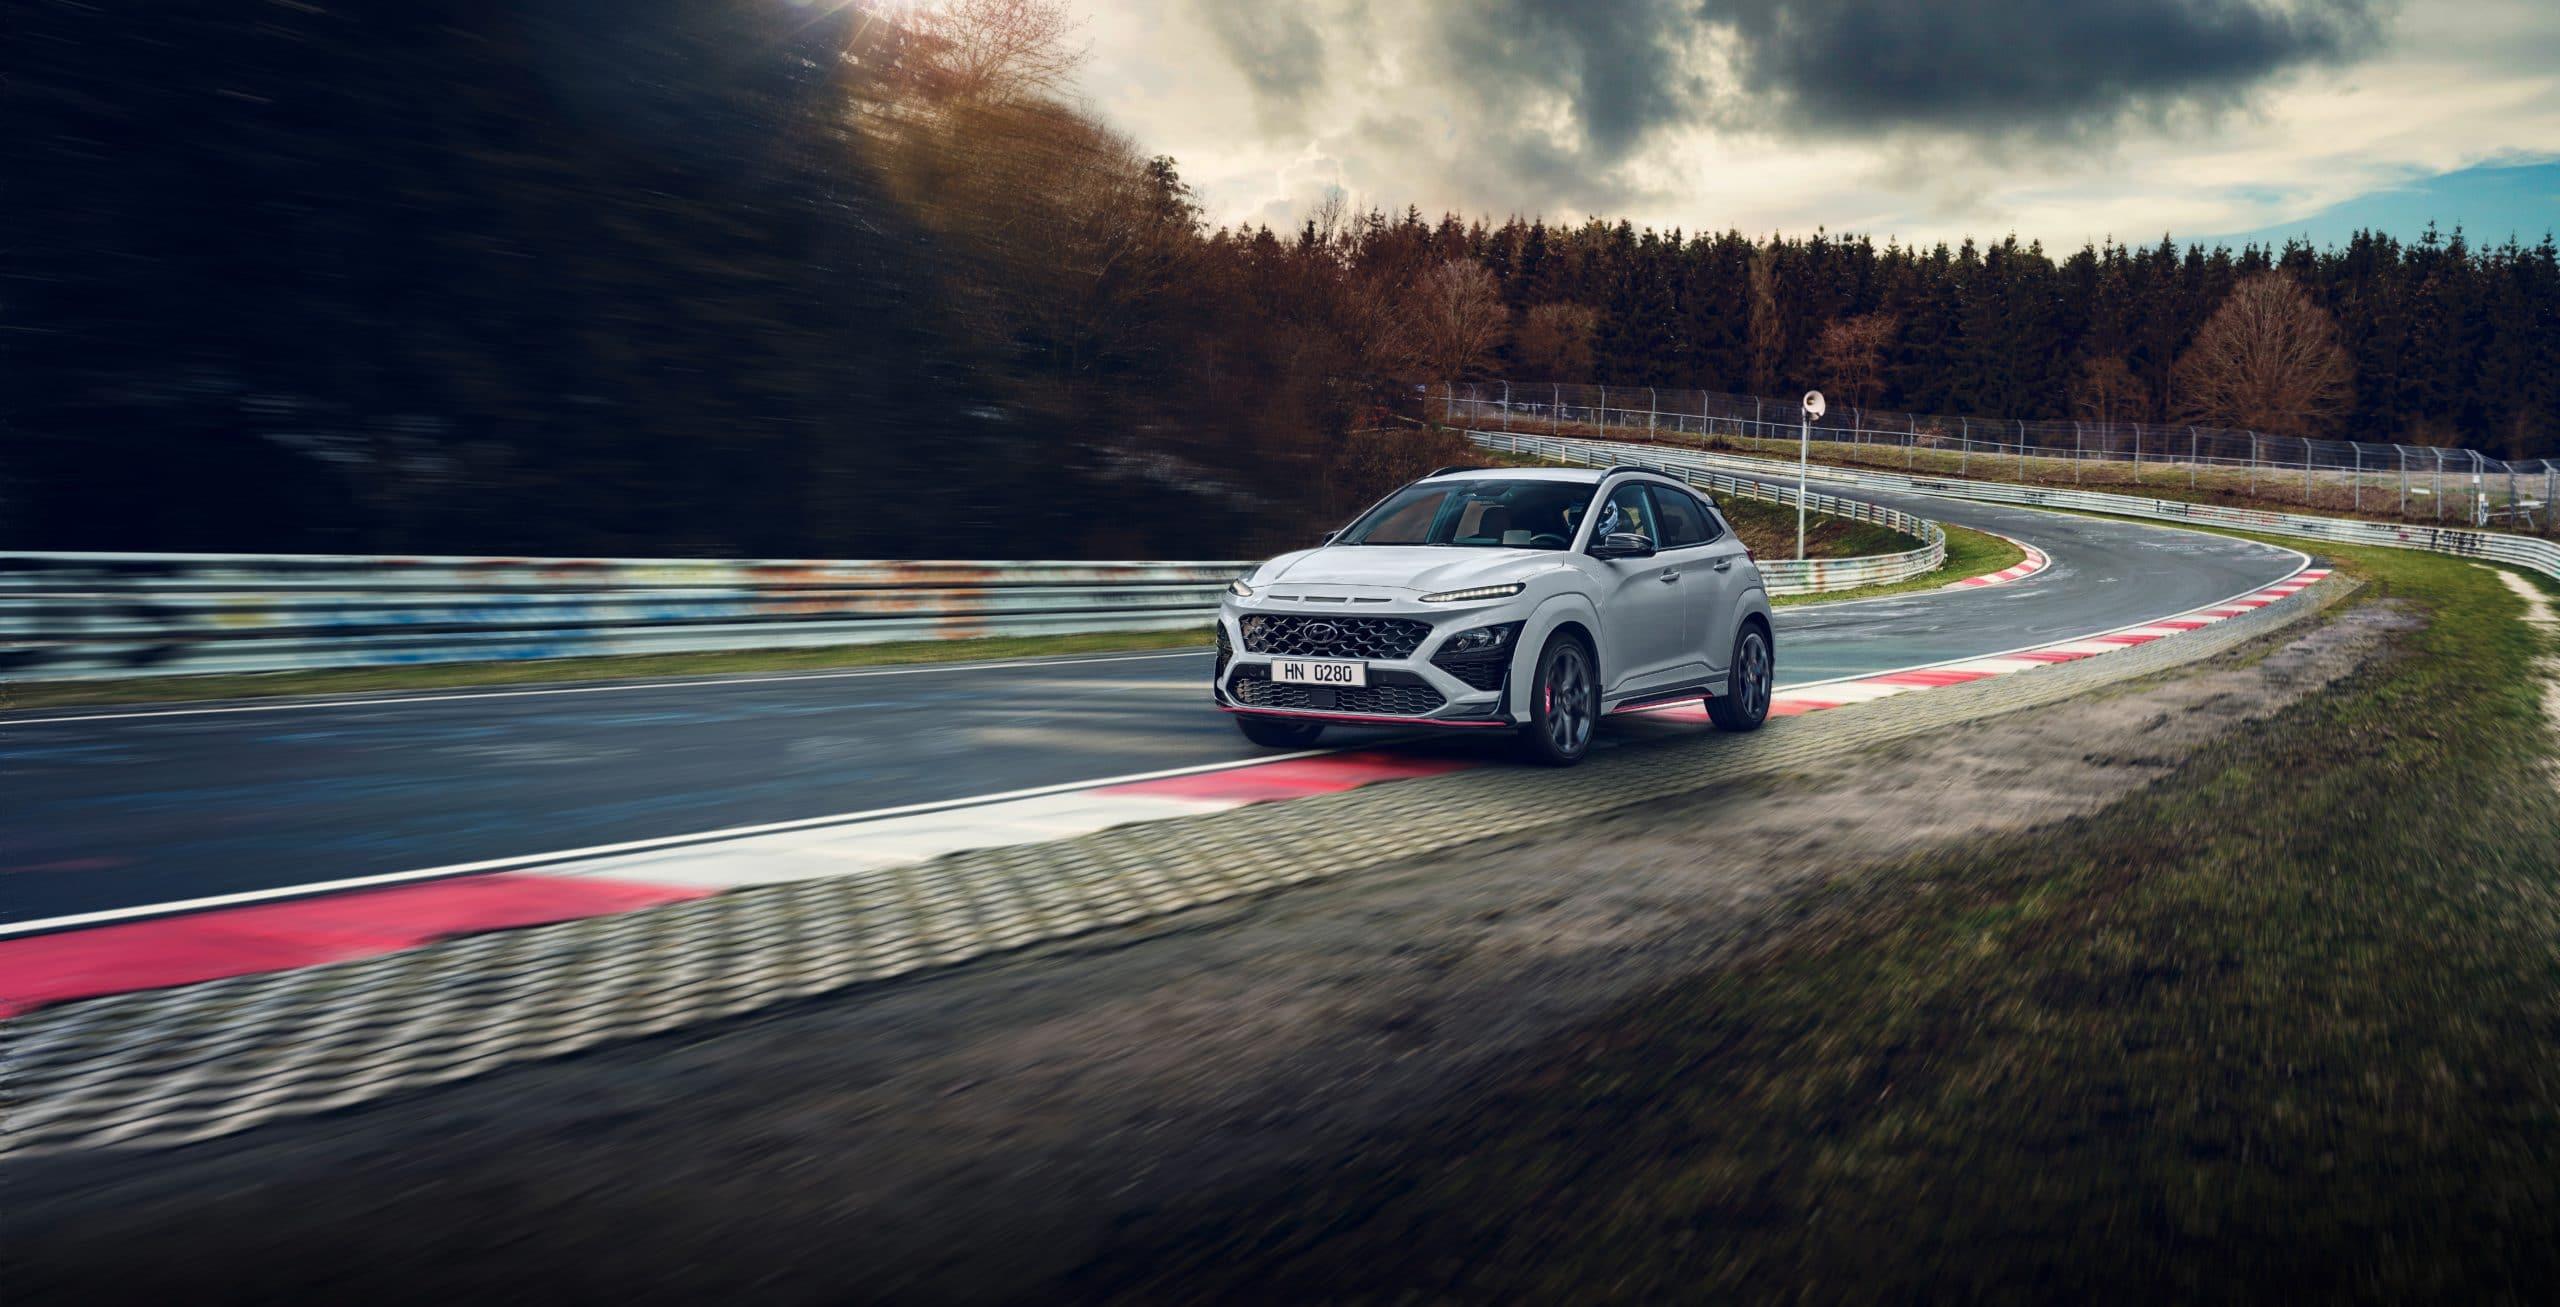 2022 Hyundai Kona N 5 scaled